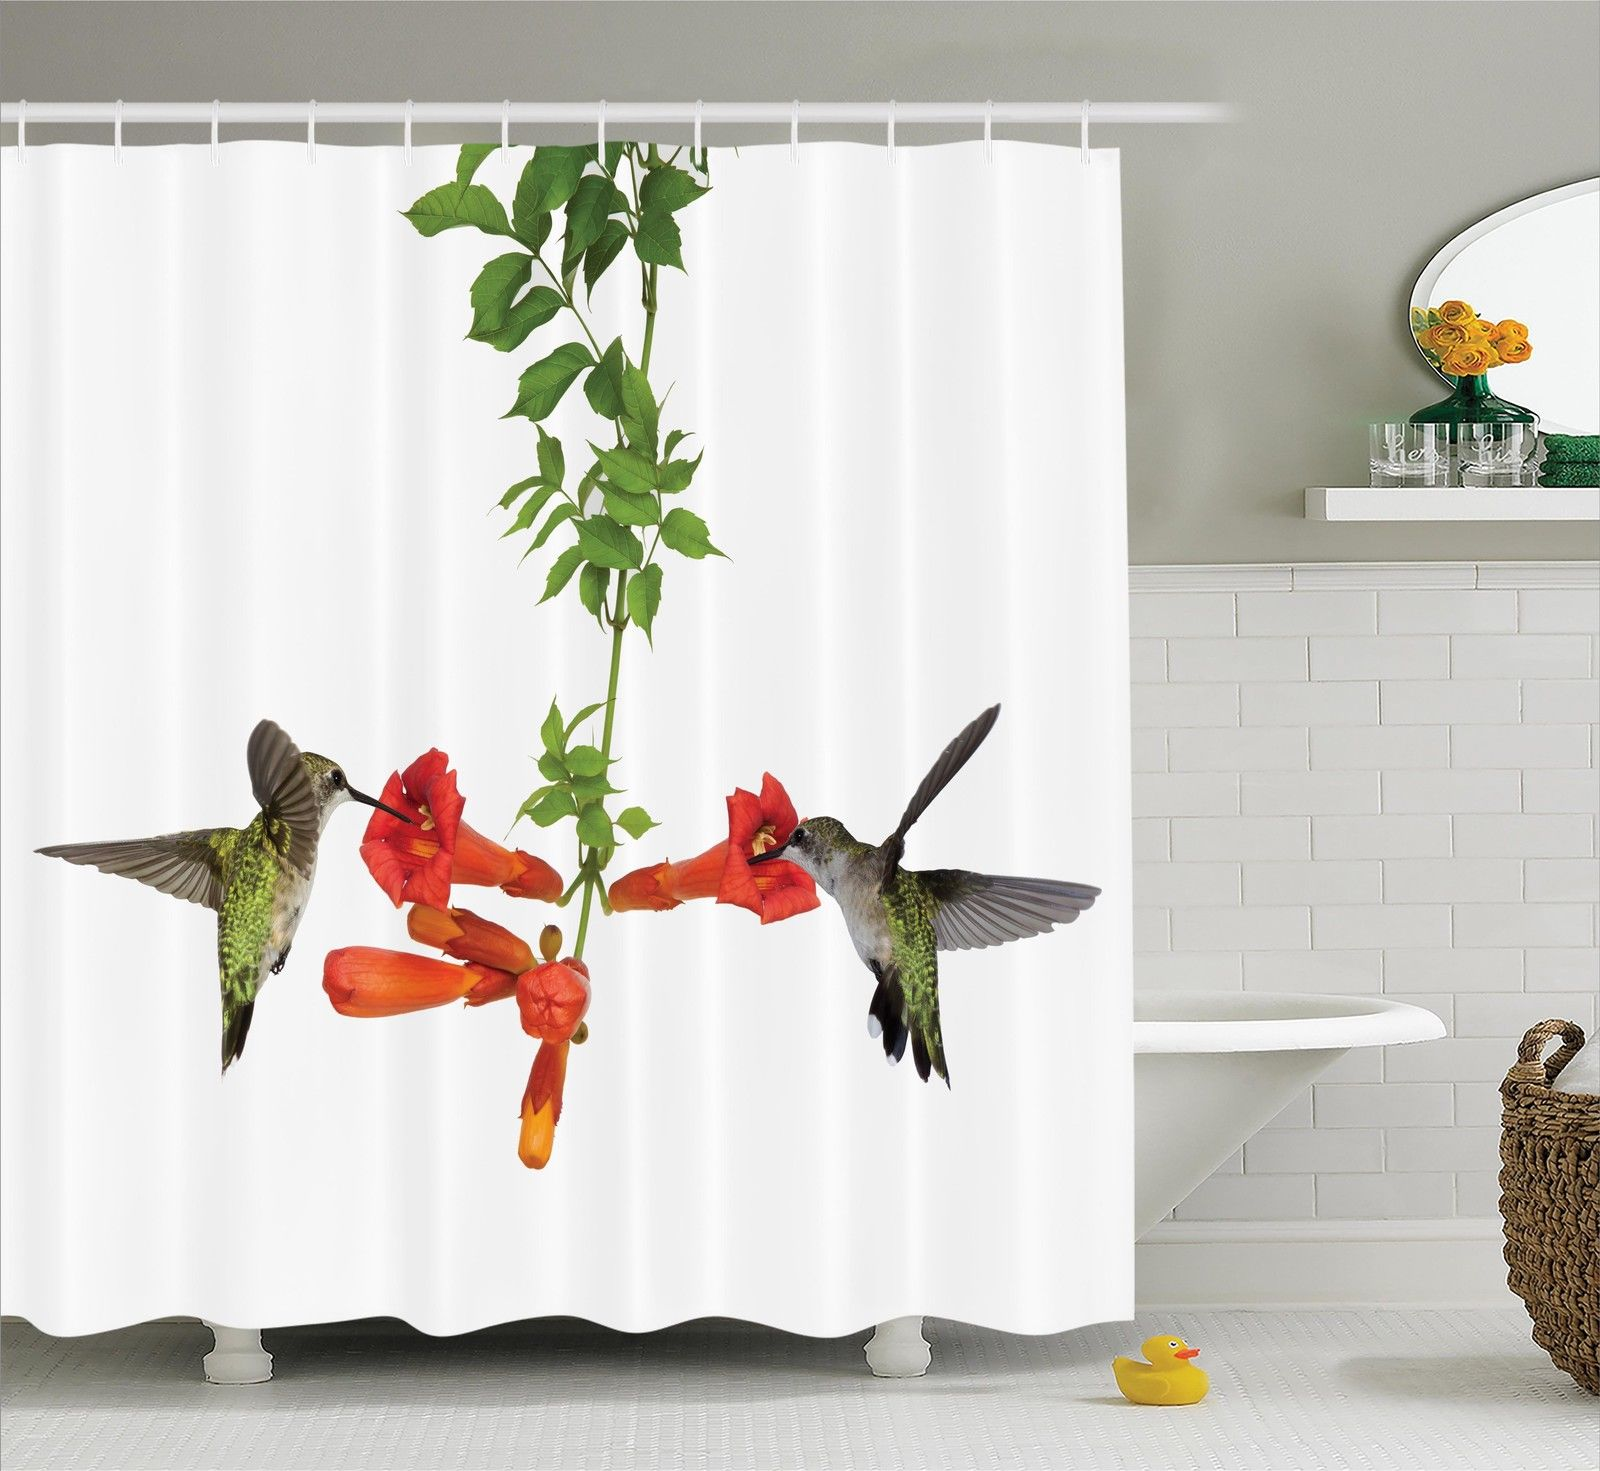 Hummingbirds Decorations Two, Hummingbird Bathroom Accessories